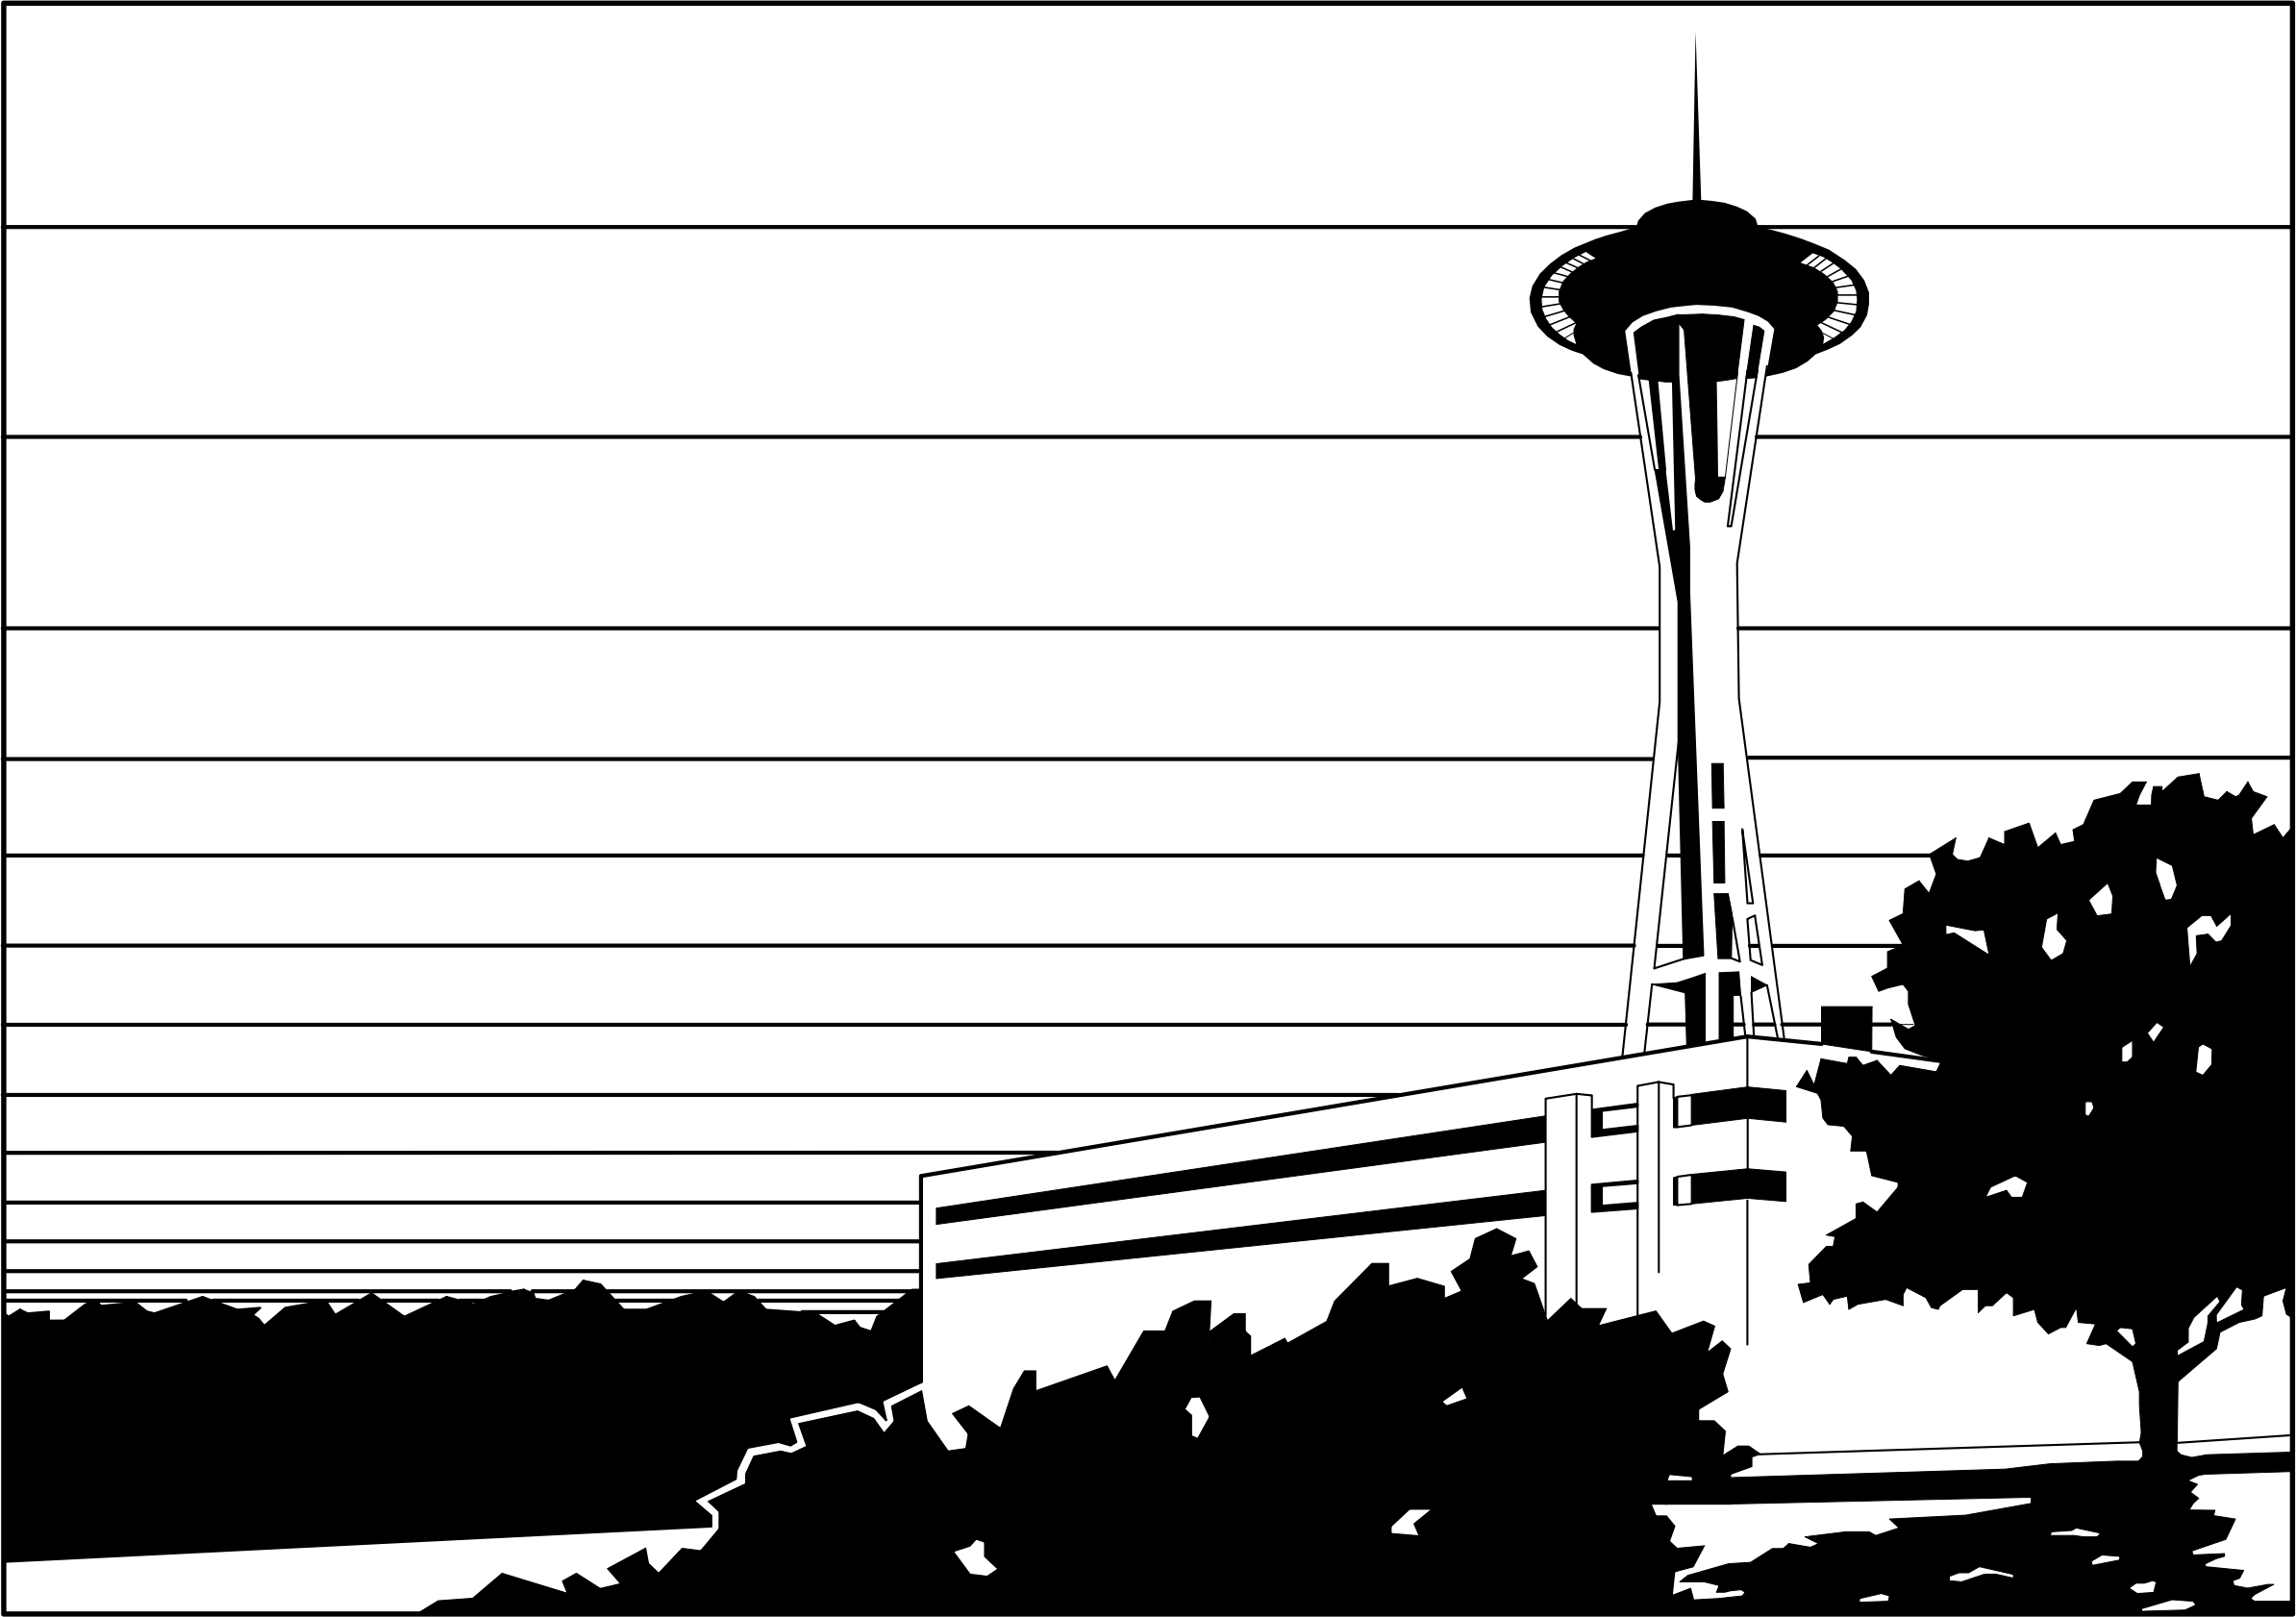 Needle clipart silhouette. Space wa big image